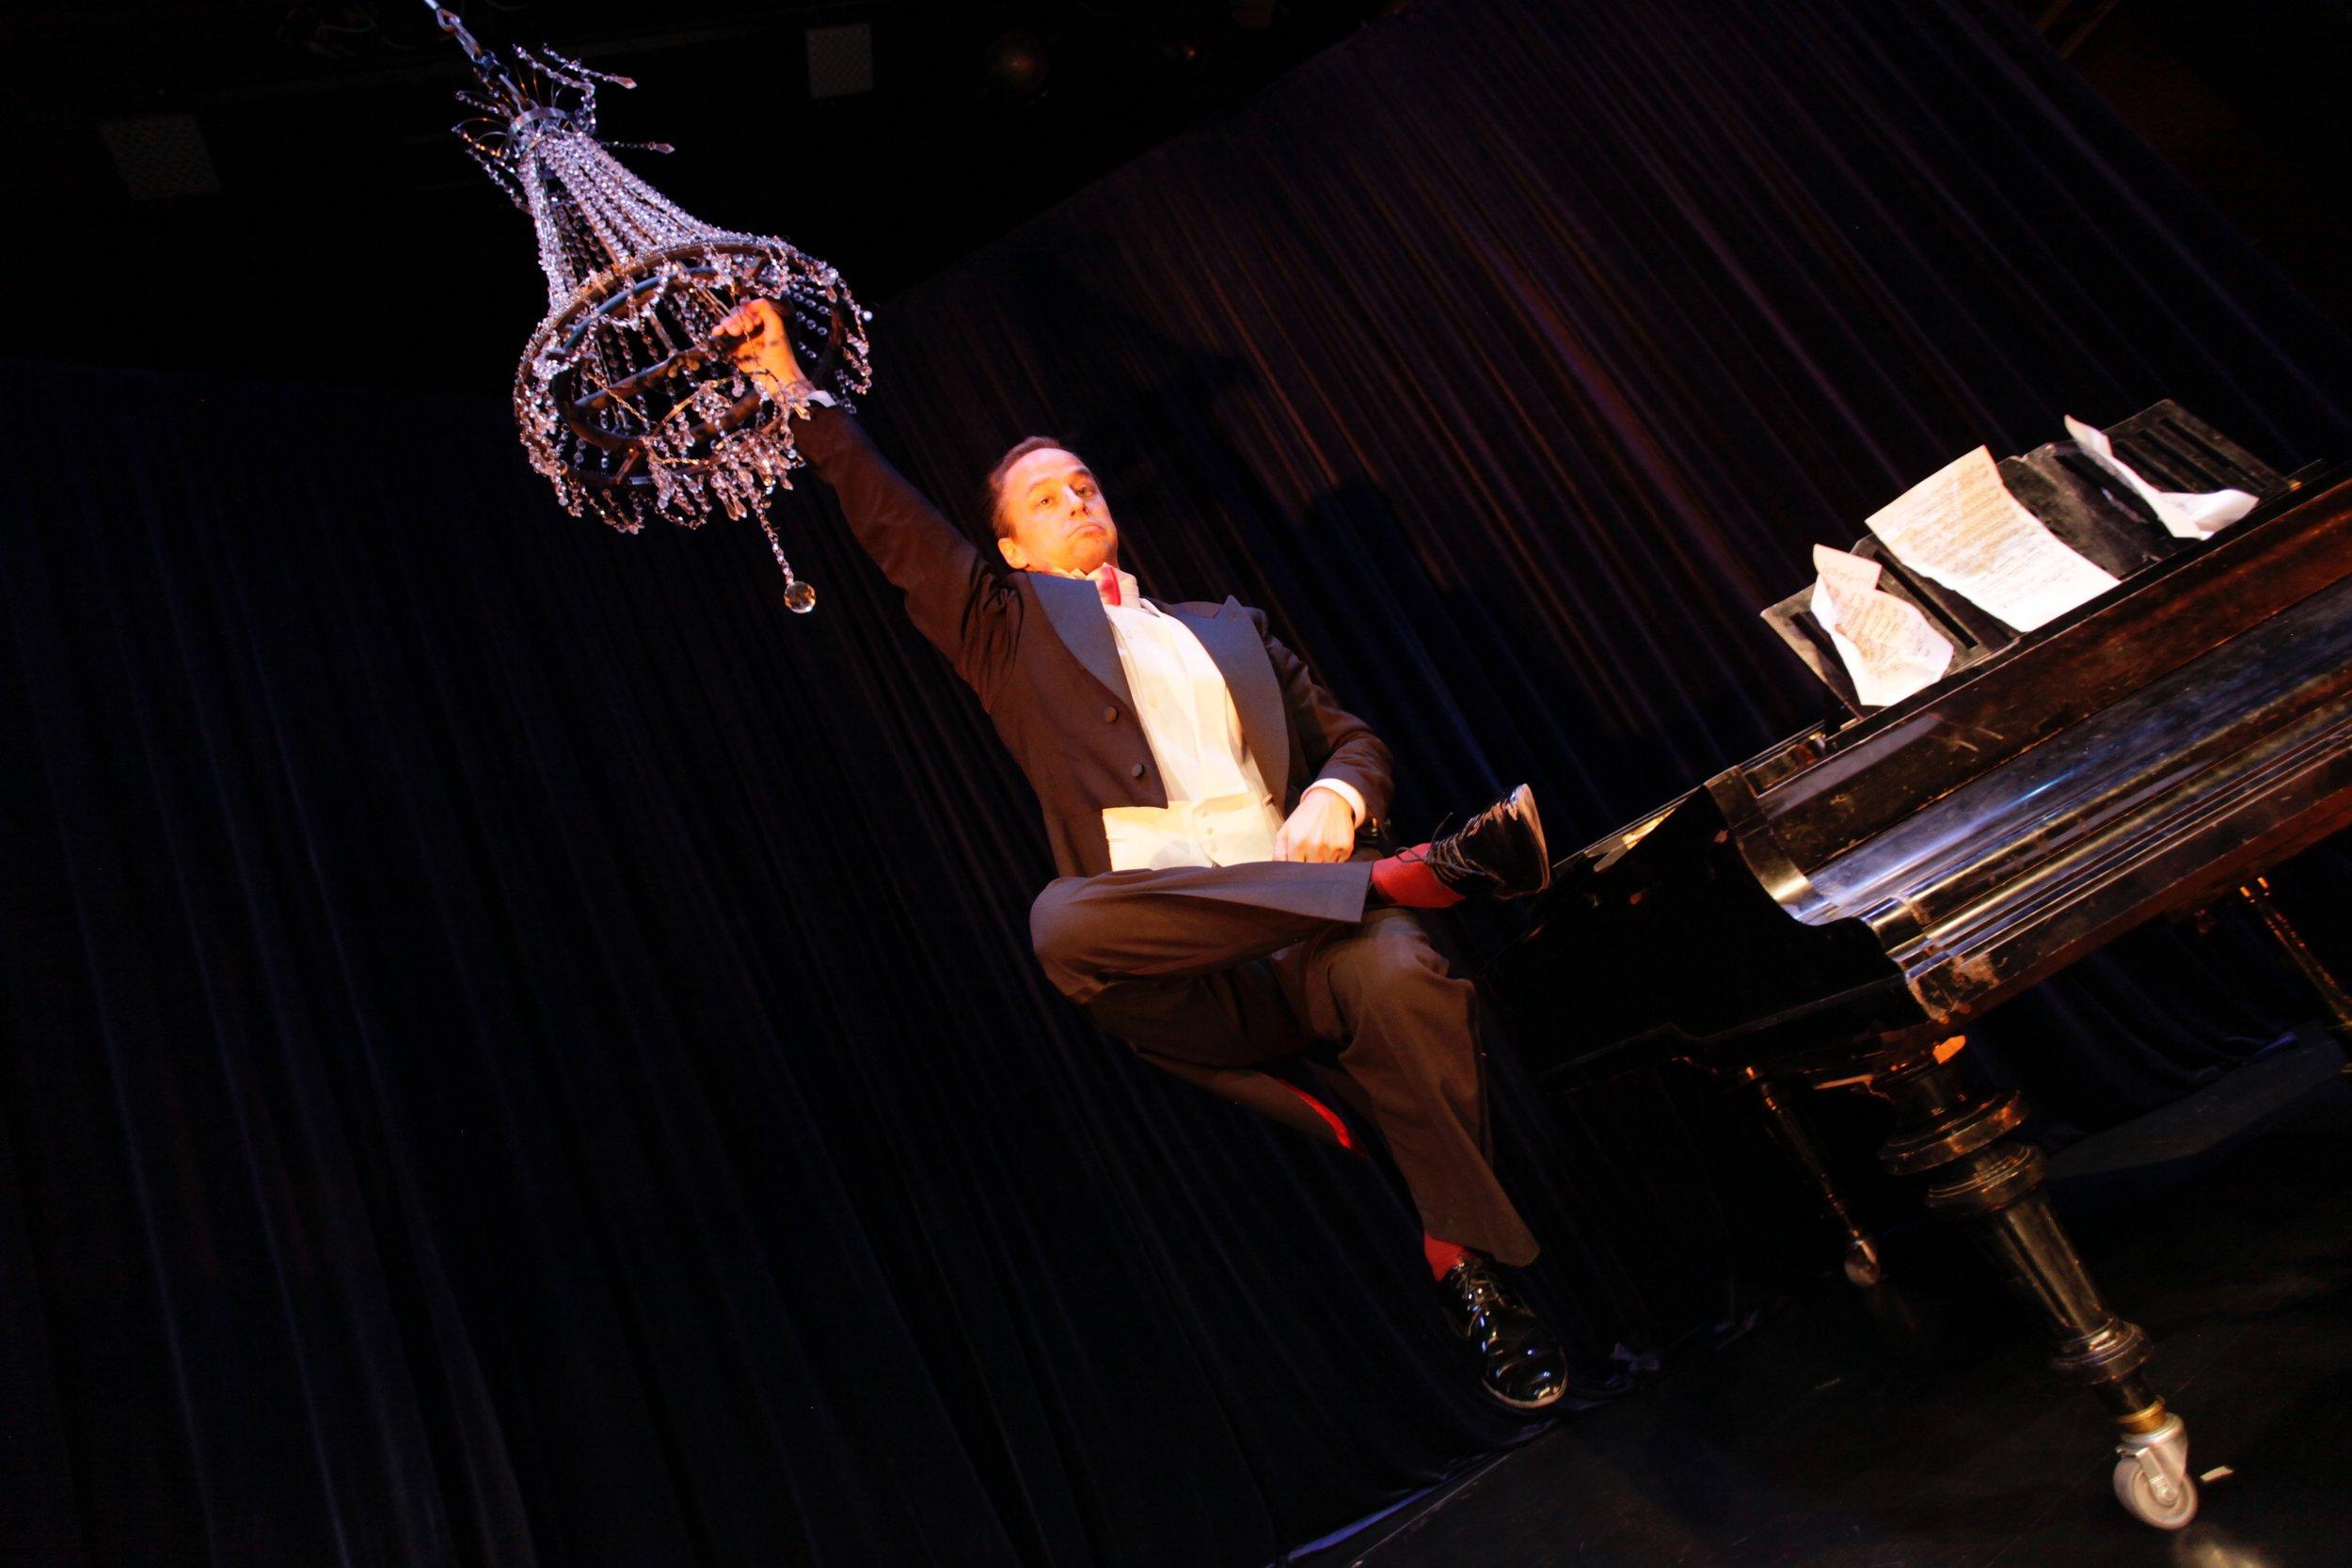 pianist_courtenay11.jpg